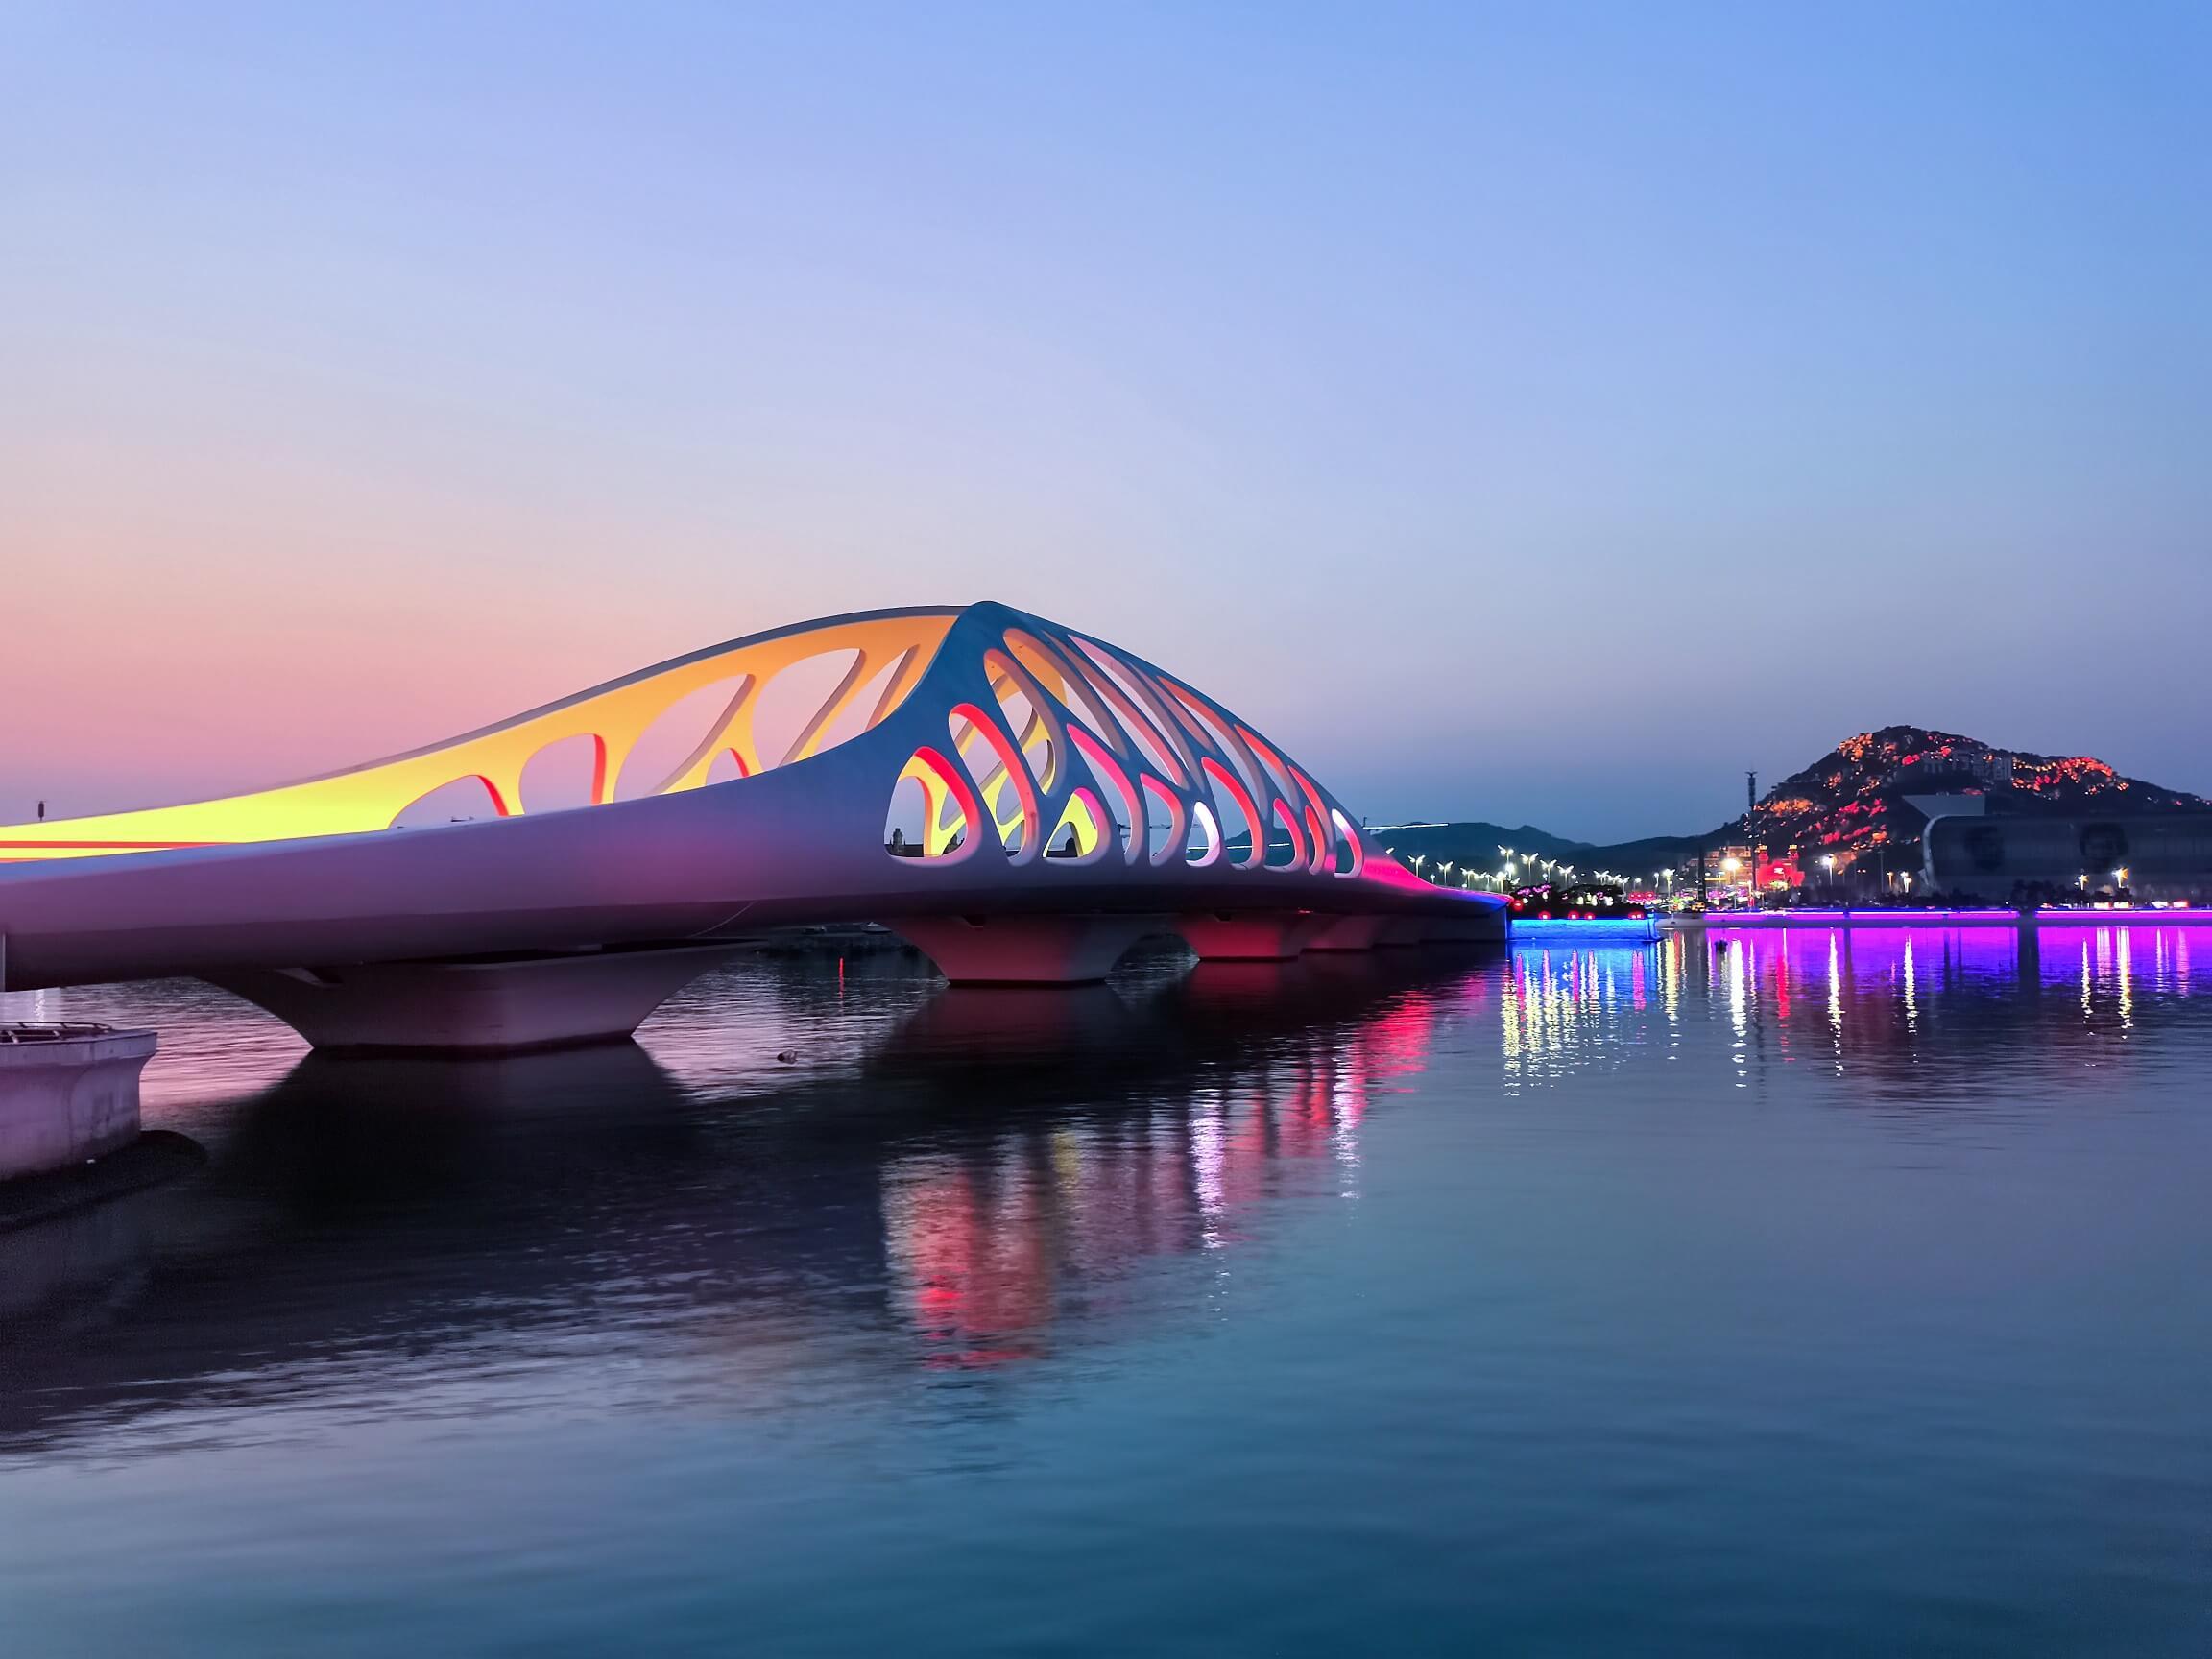 Nova7 VanlifeDiaries(房车日记) Qingdao China 03